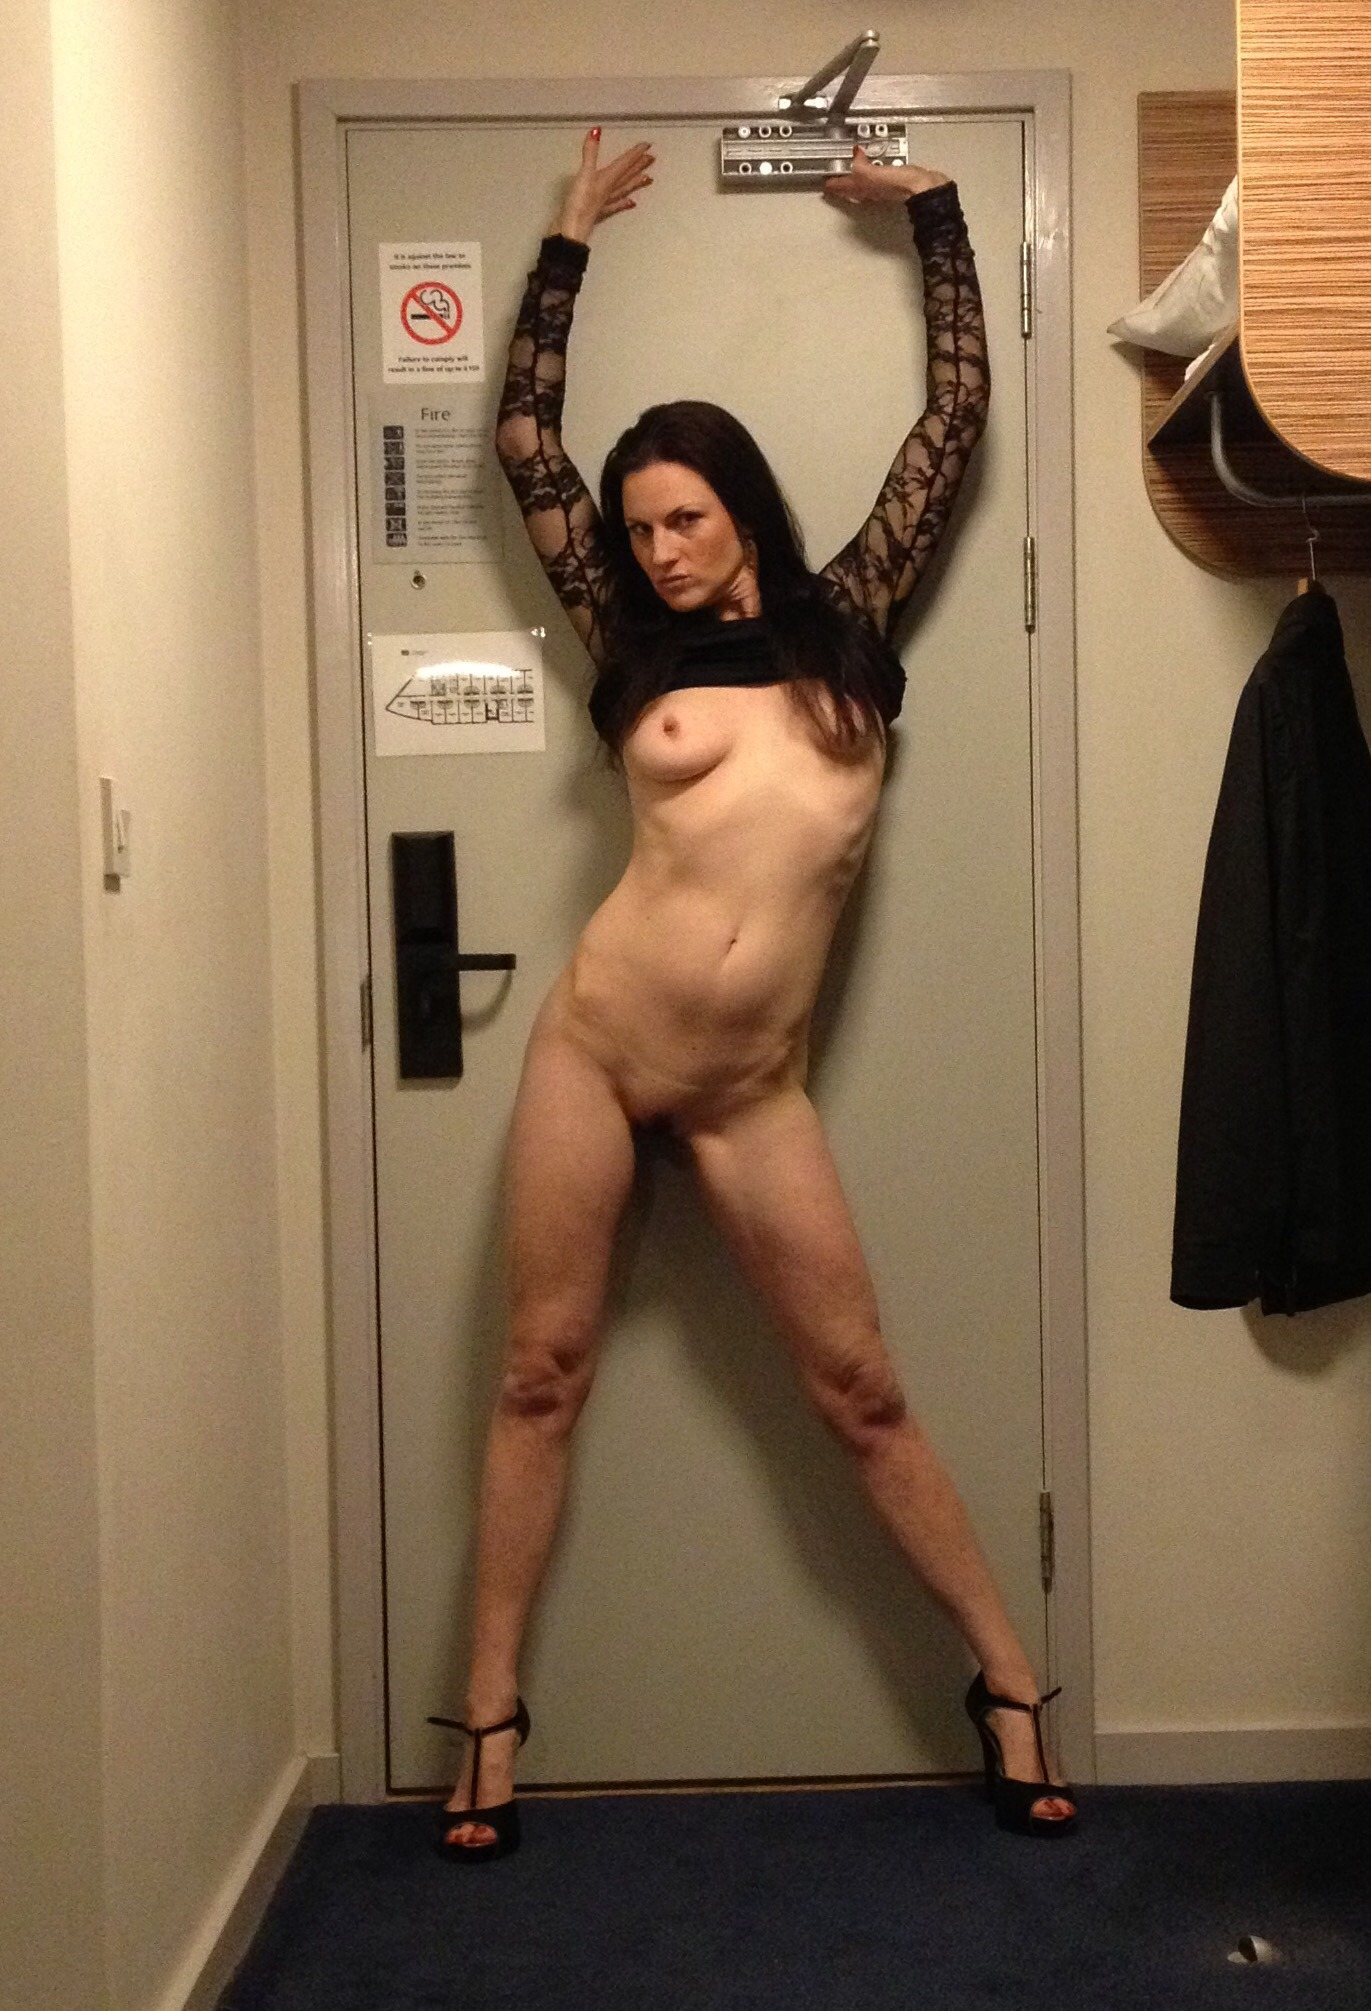 briana blair handjob porn new xxx